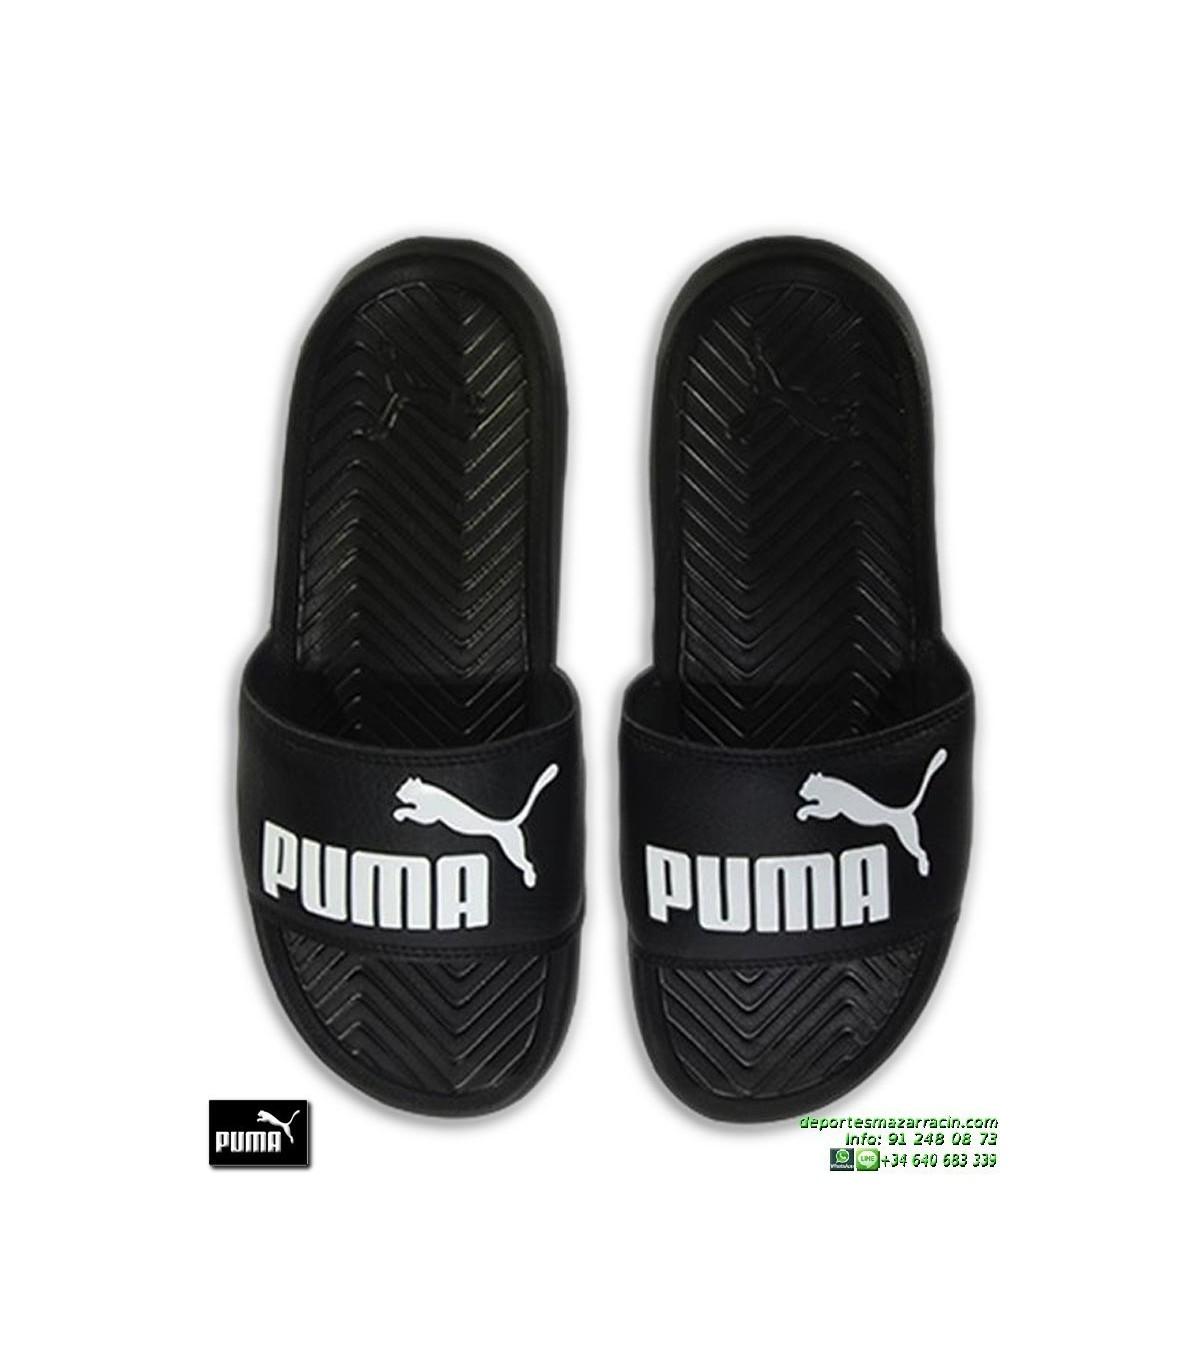 6c8dc179f Chancla Puma Mujer POPCAT Negro-Blanco sandalia pala mujer